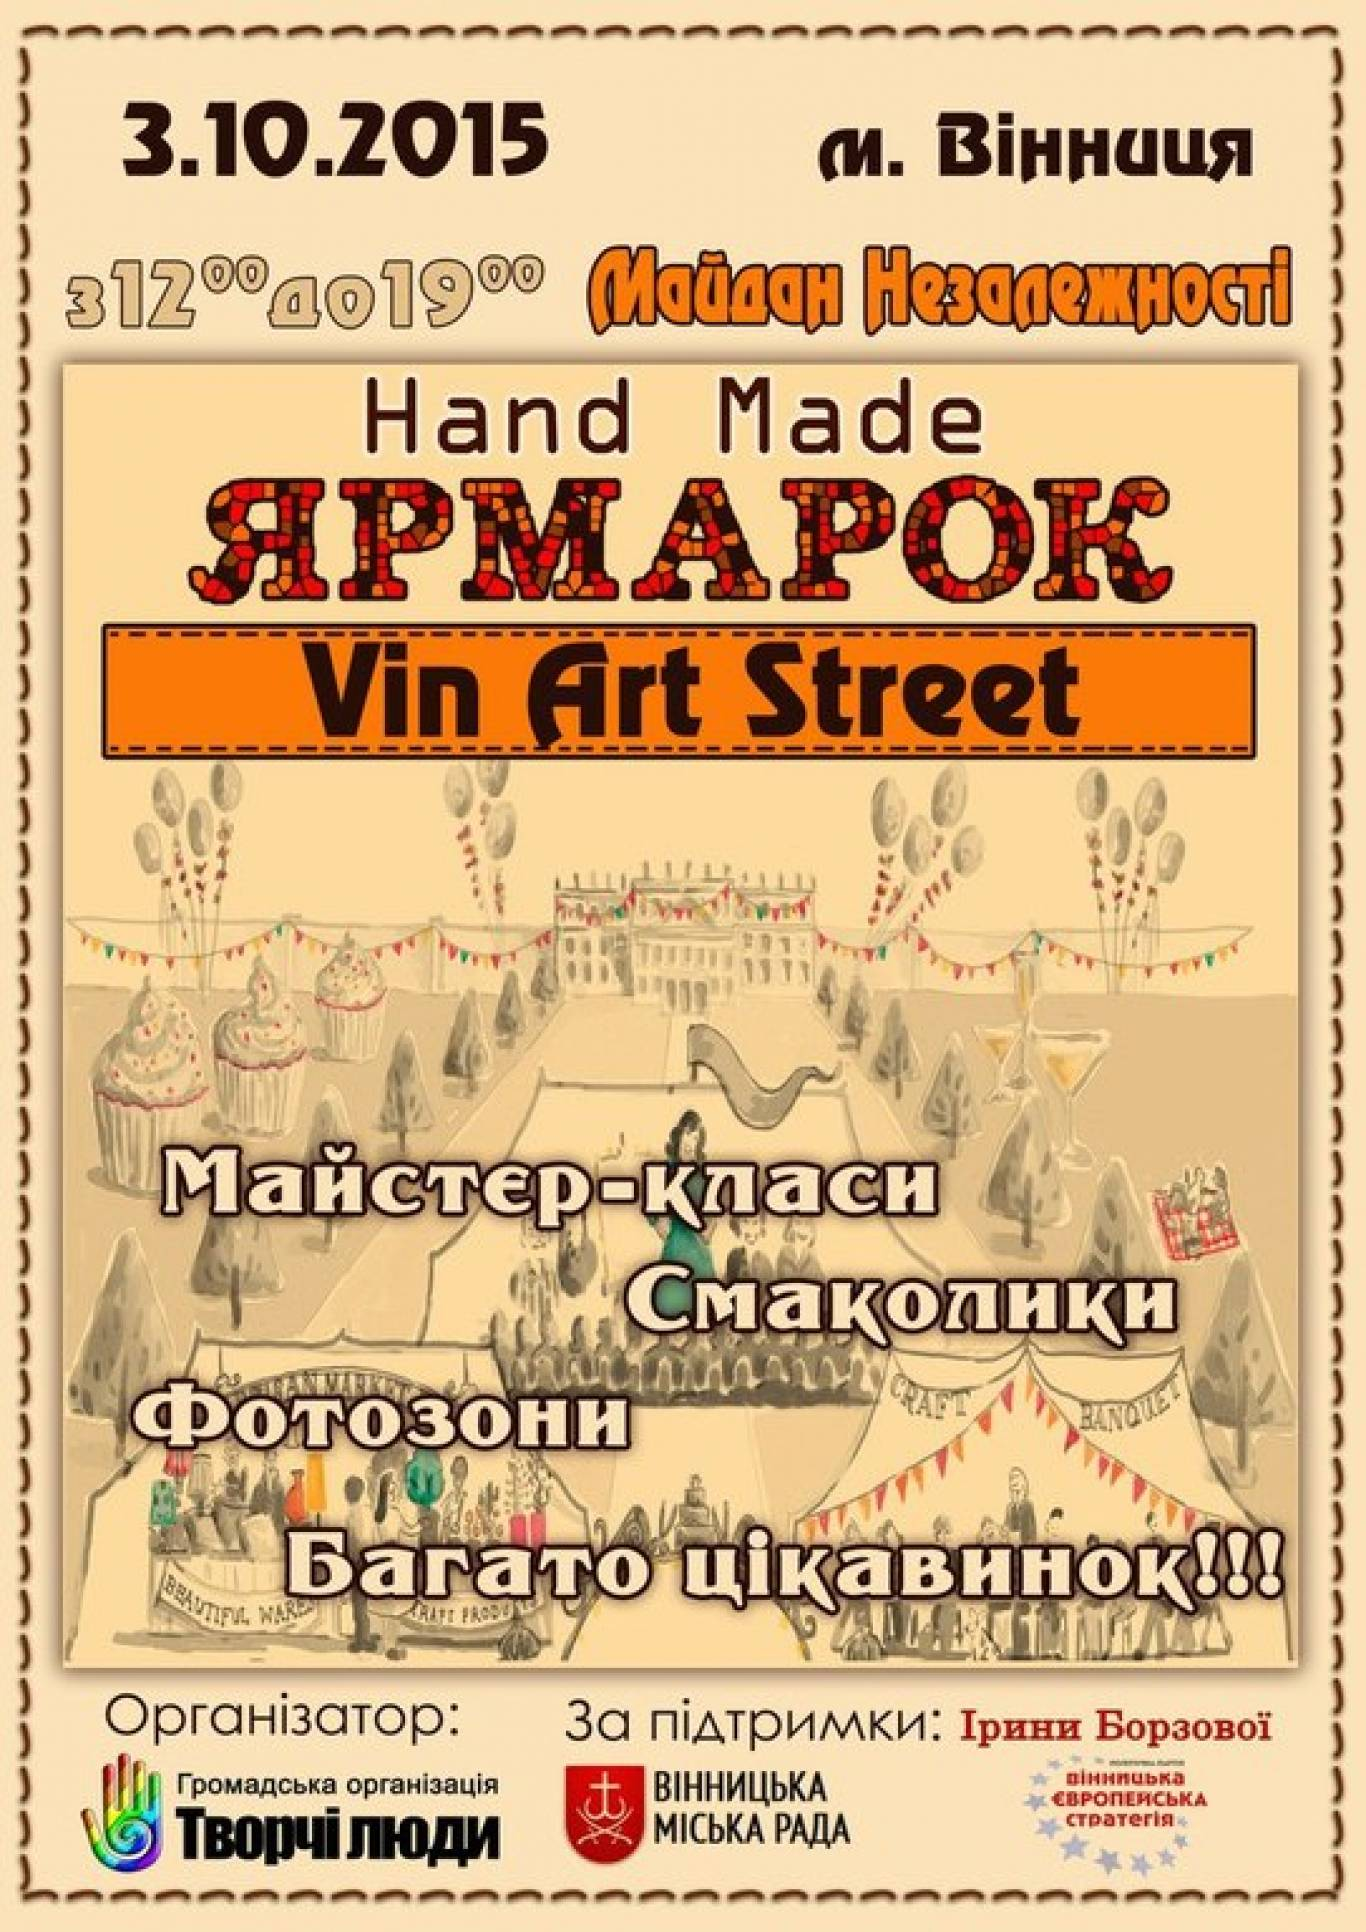 Великий ярмарок Hand made - «Vin Art Street»